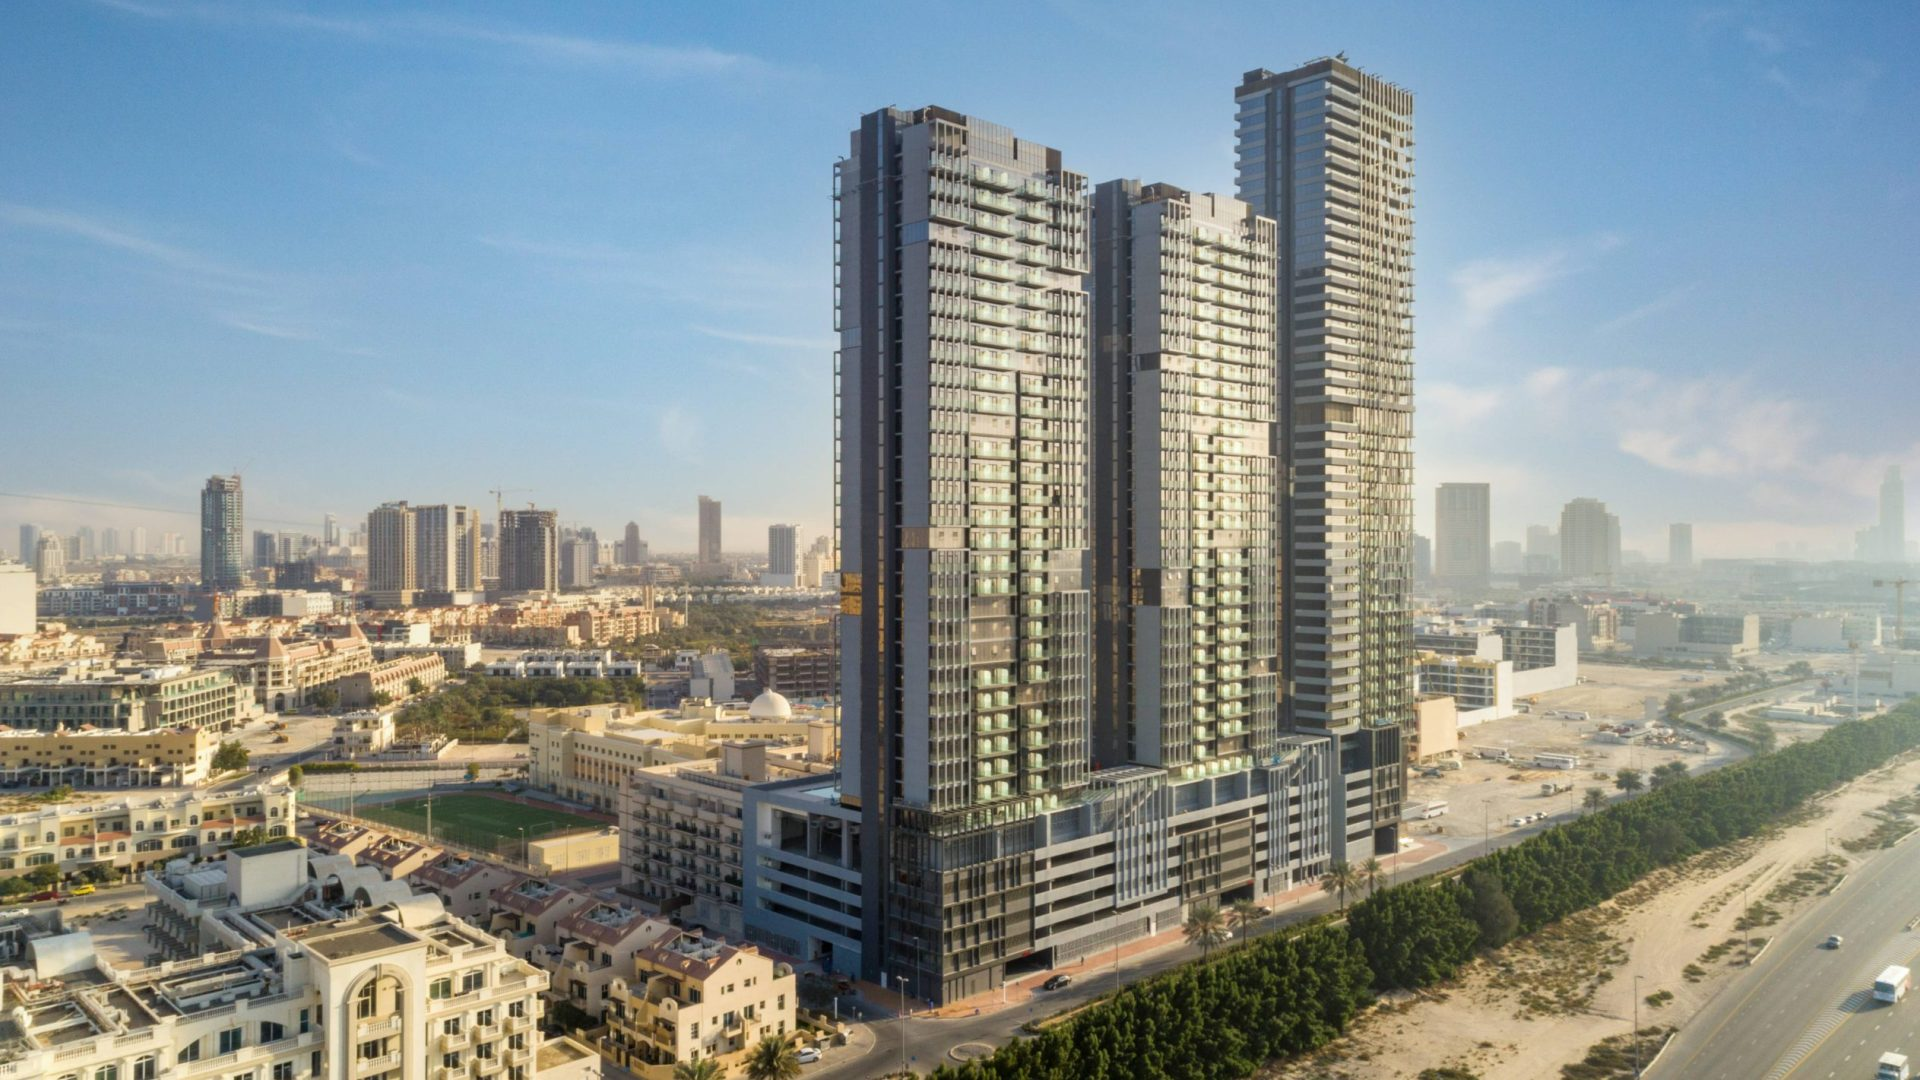 BLOOM TOWERS, Jumeirah Village Circle, Dubai, UAE – photo 9